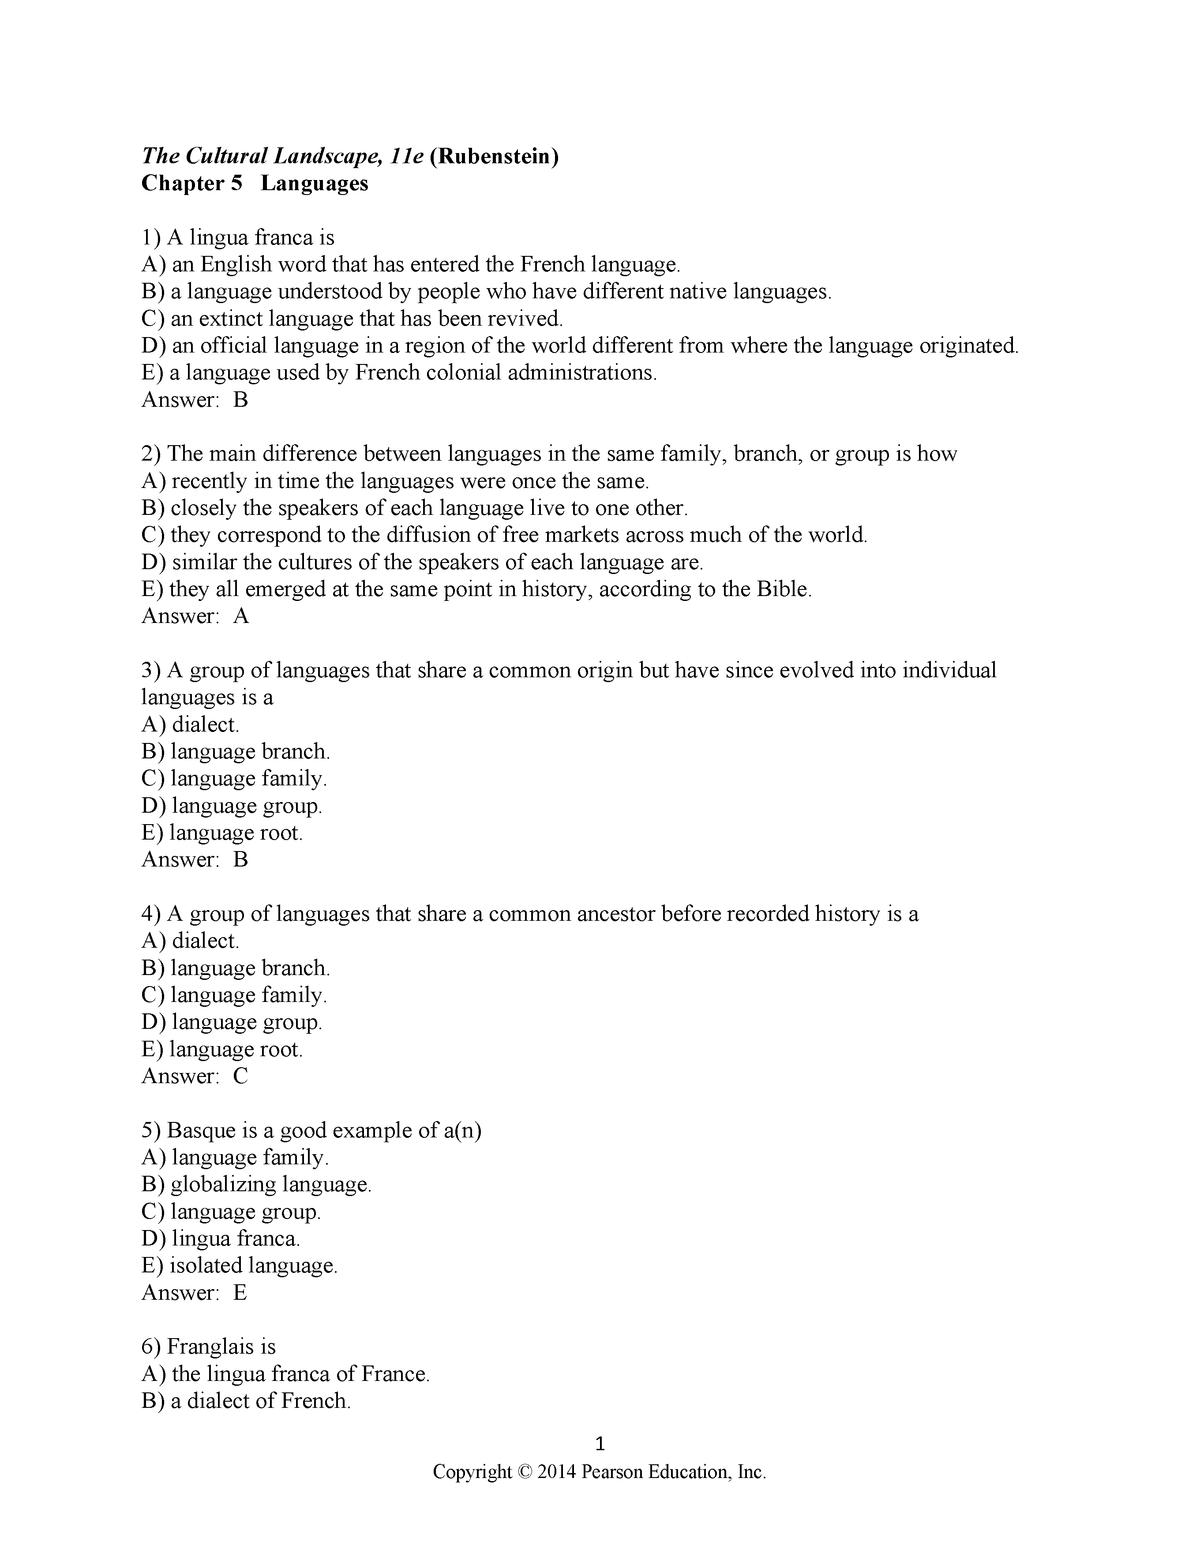 Liszt consolation no 3 analysis report